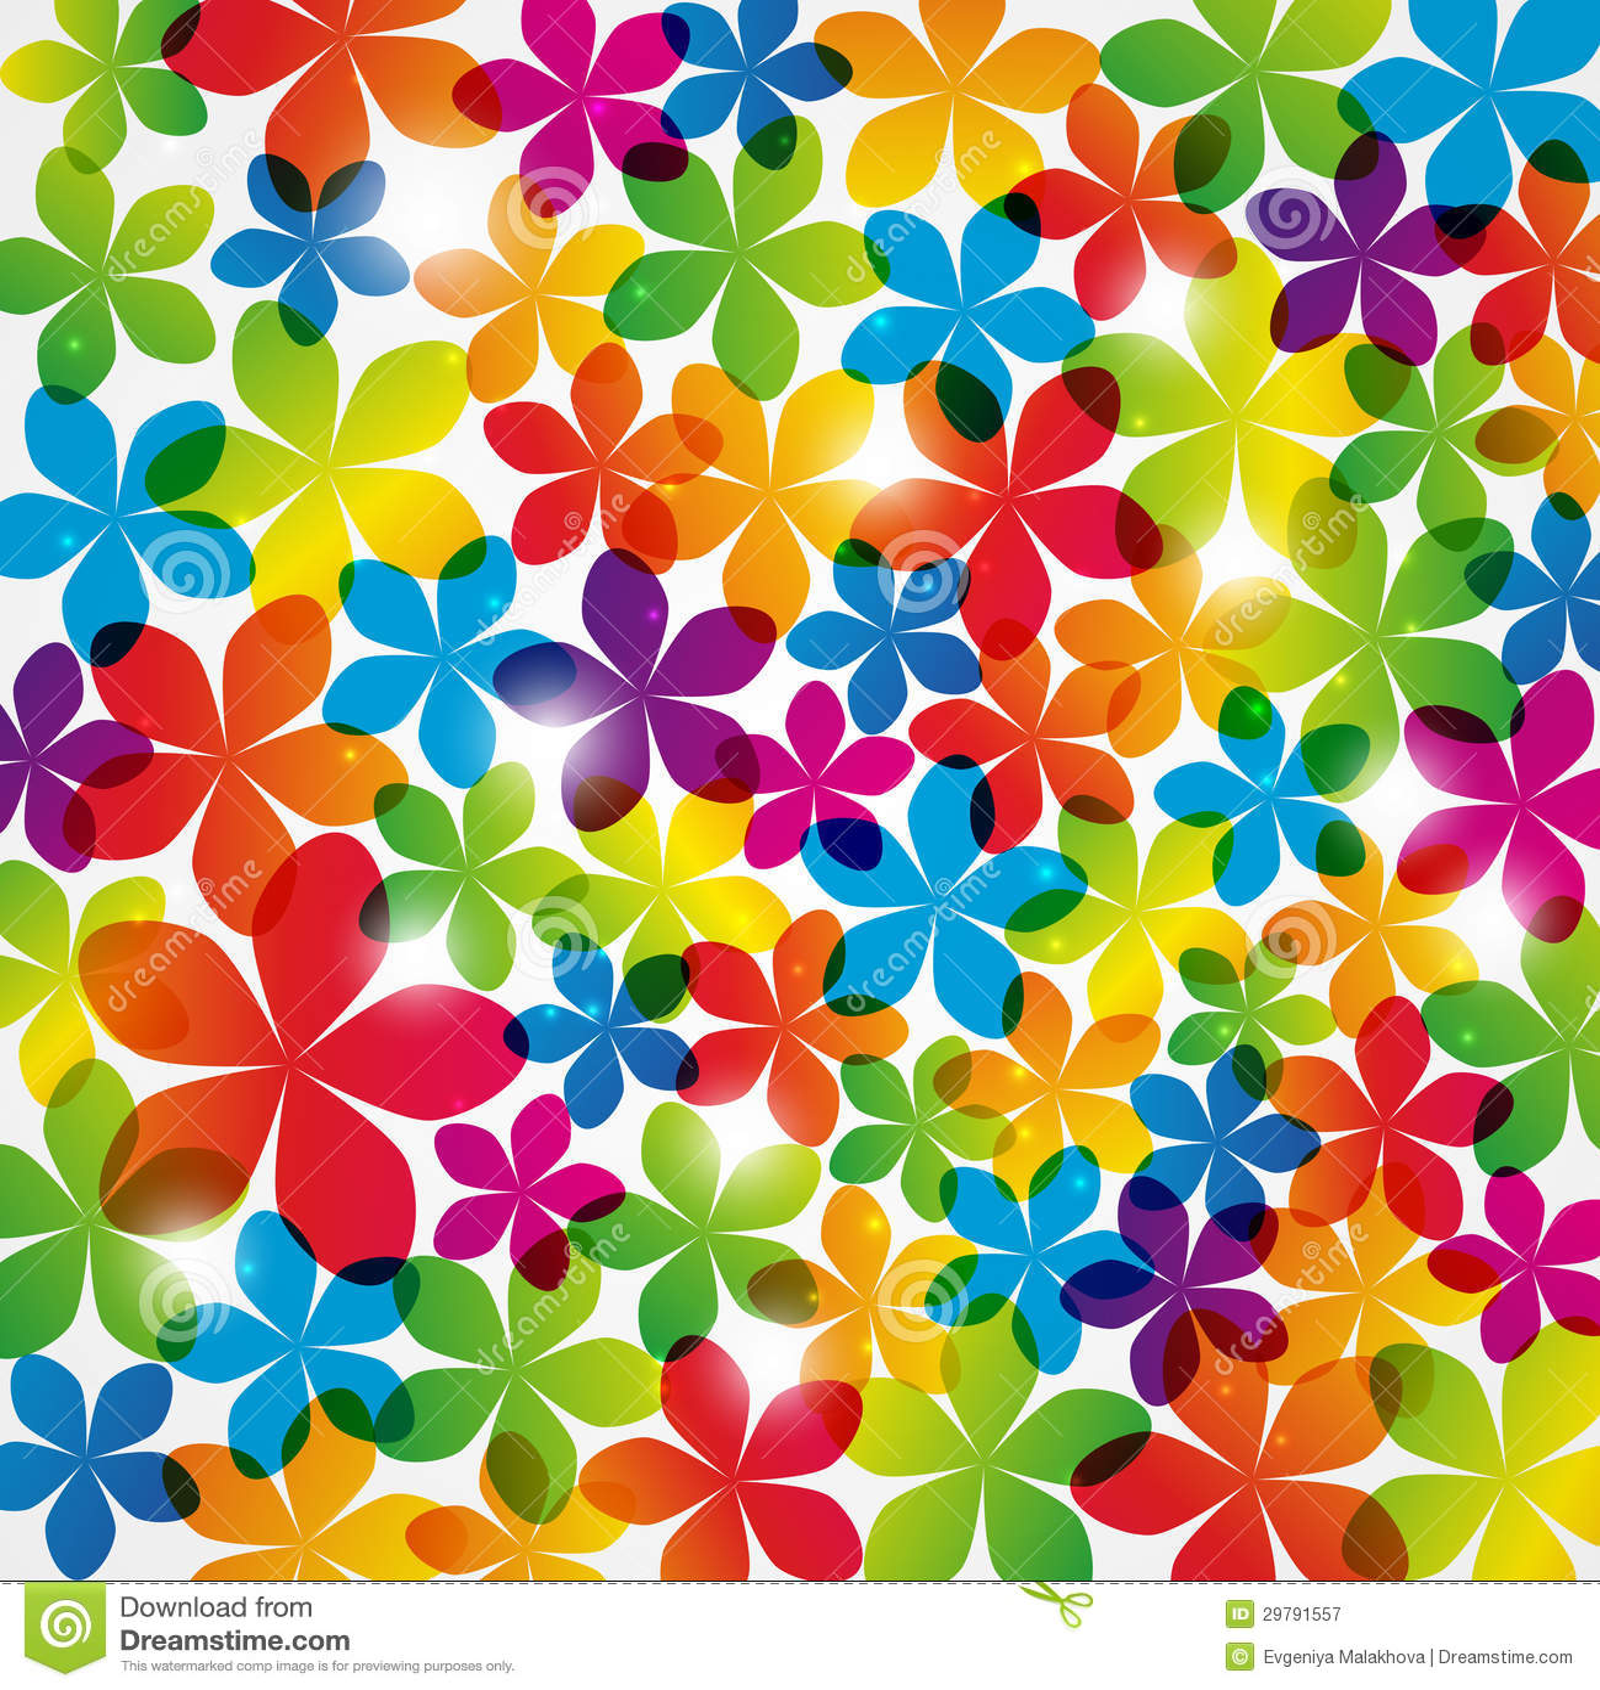 rainbow flower background - photo #25